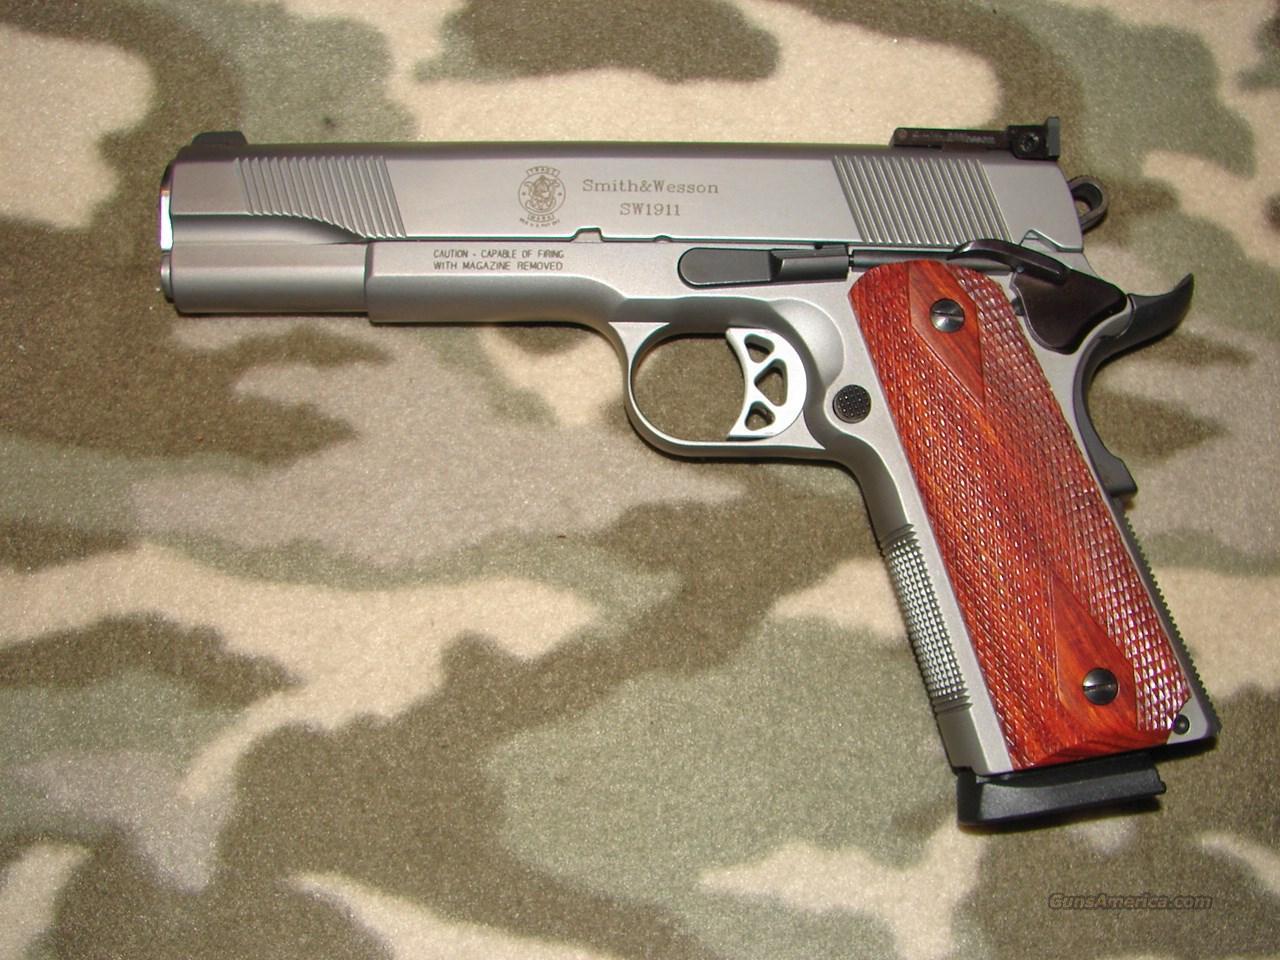 Smith & Wesson SW1911  Guns > Pistols > Smith & Wesson Pistols - Autos > Steel Frame